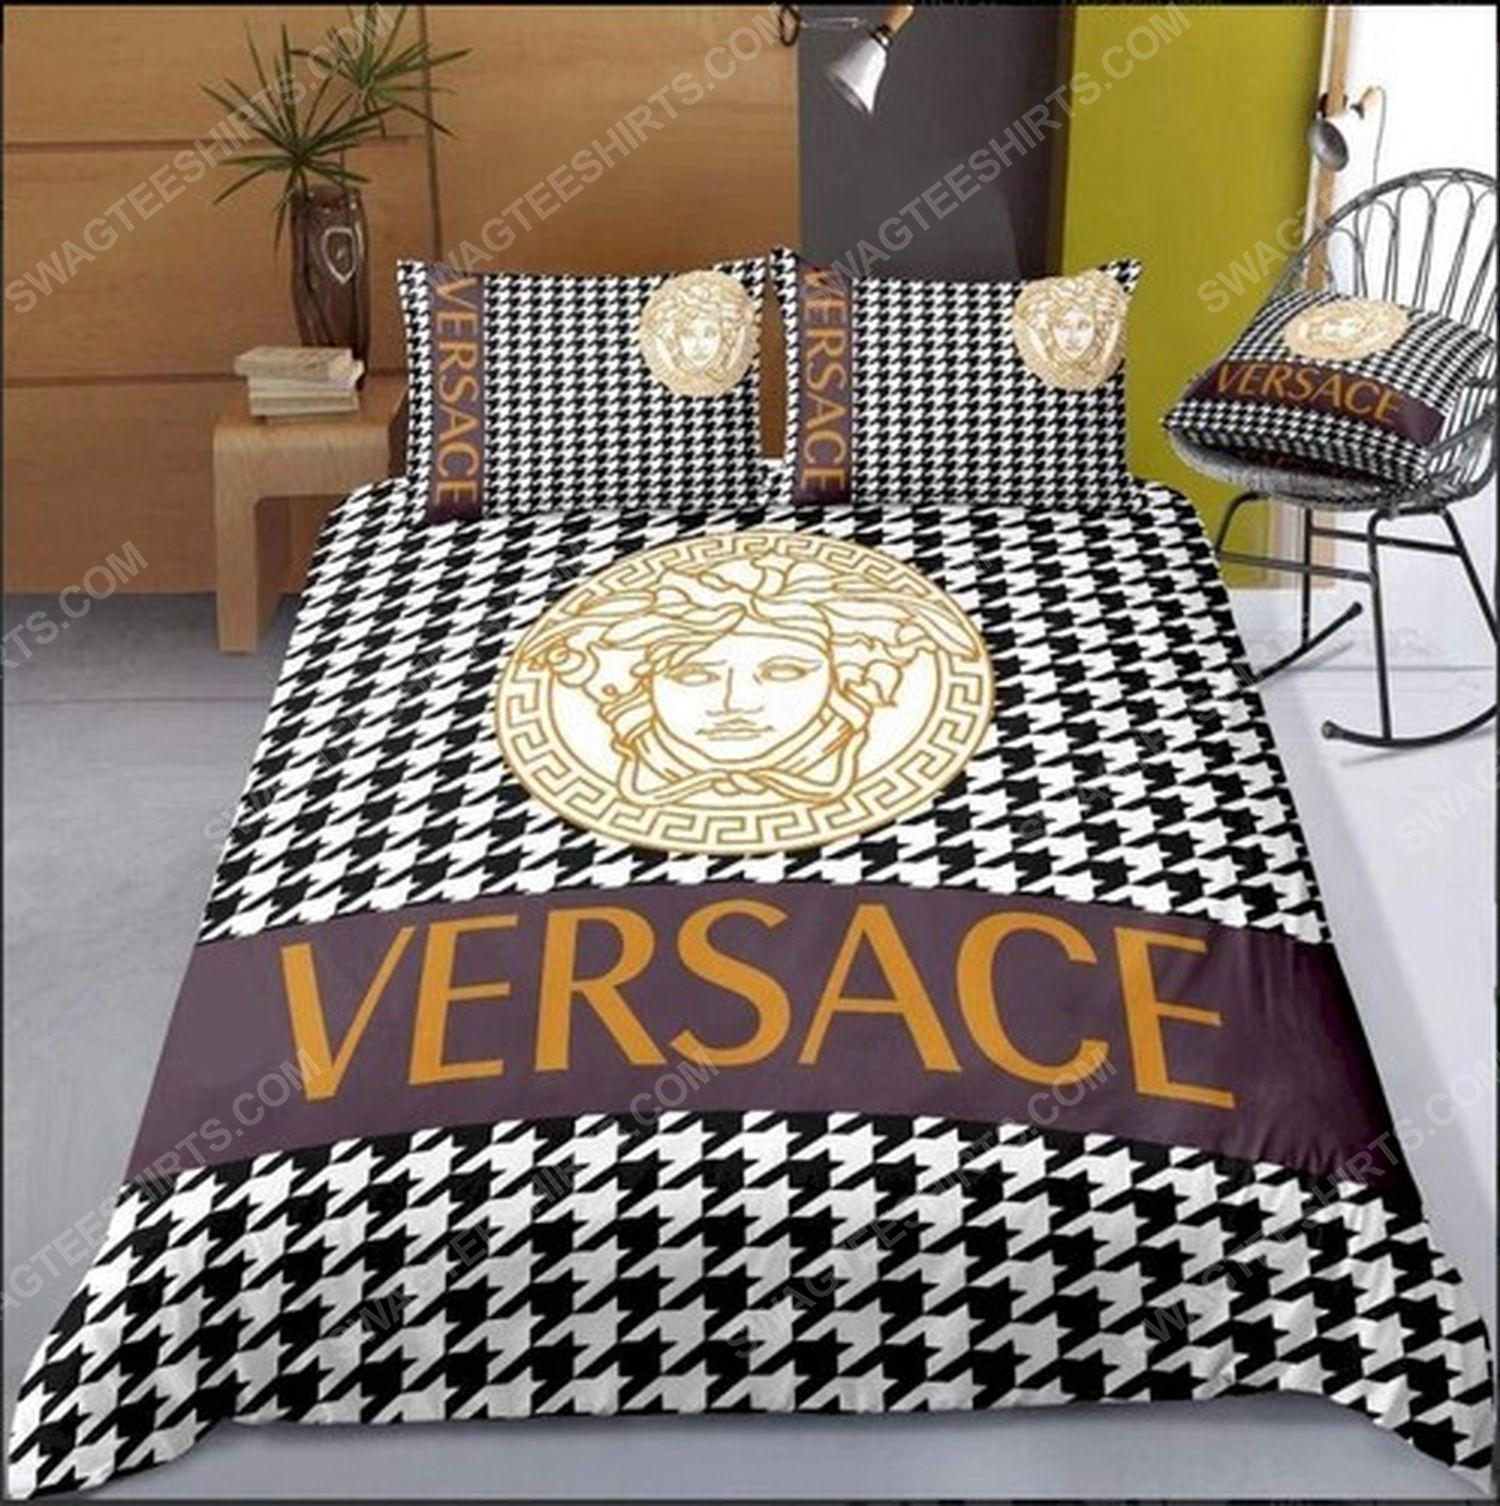 Versace home monogram full print duvet cover bedding set 2 - Copy